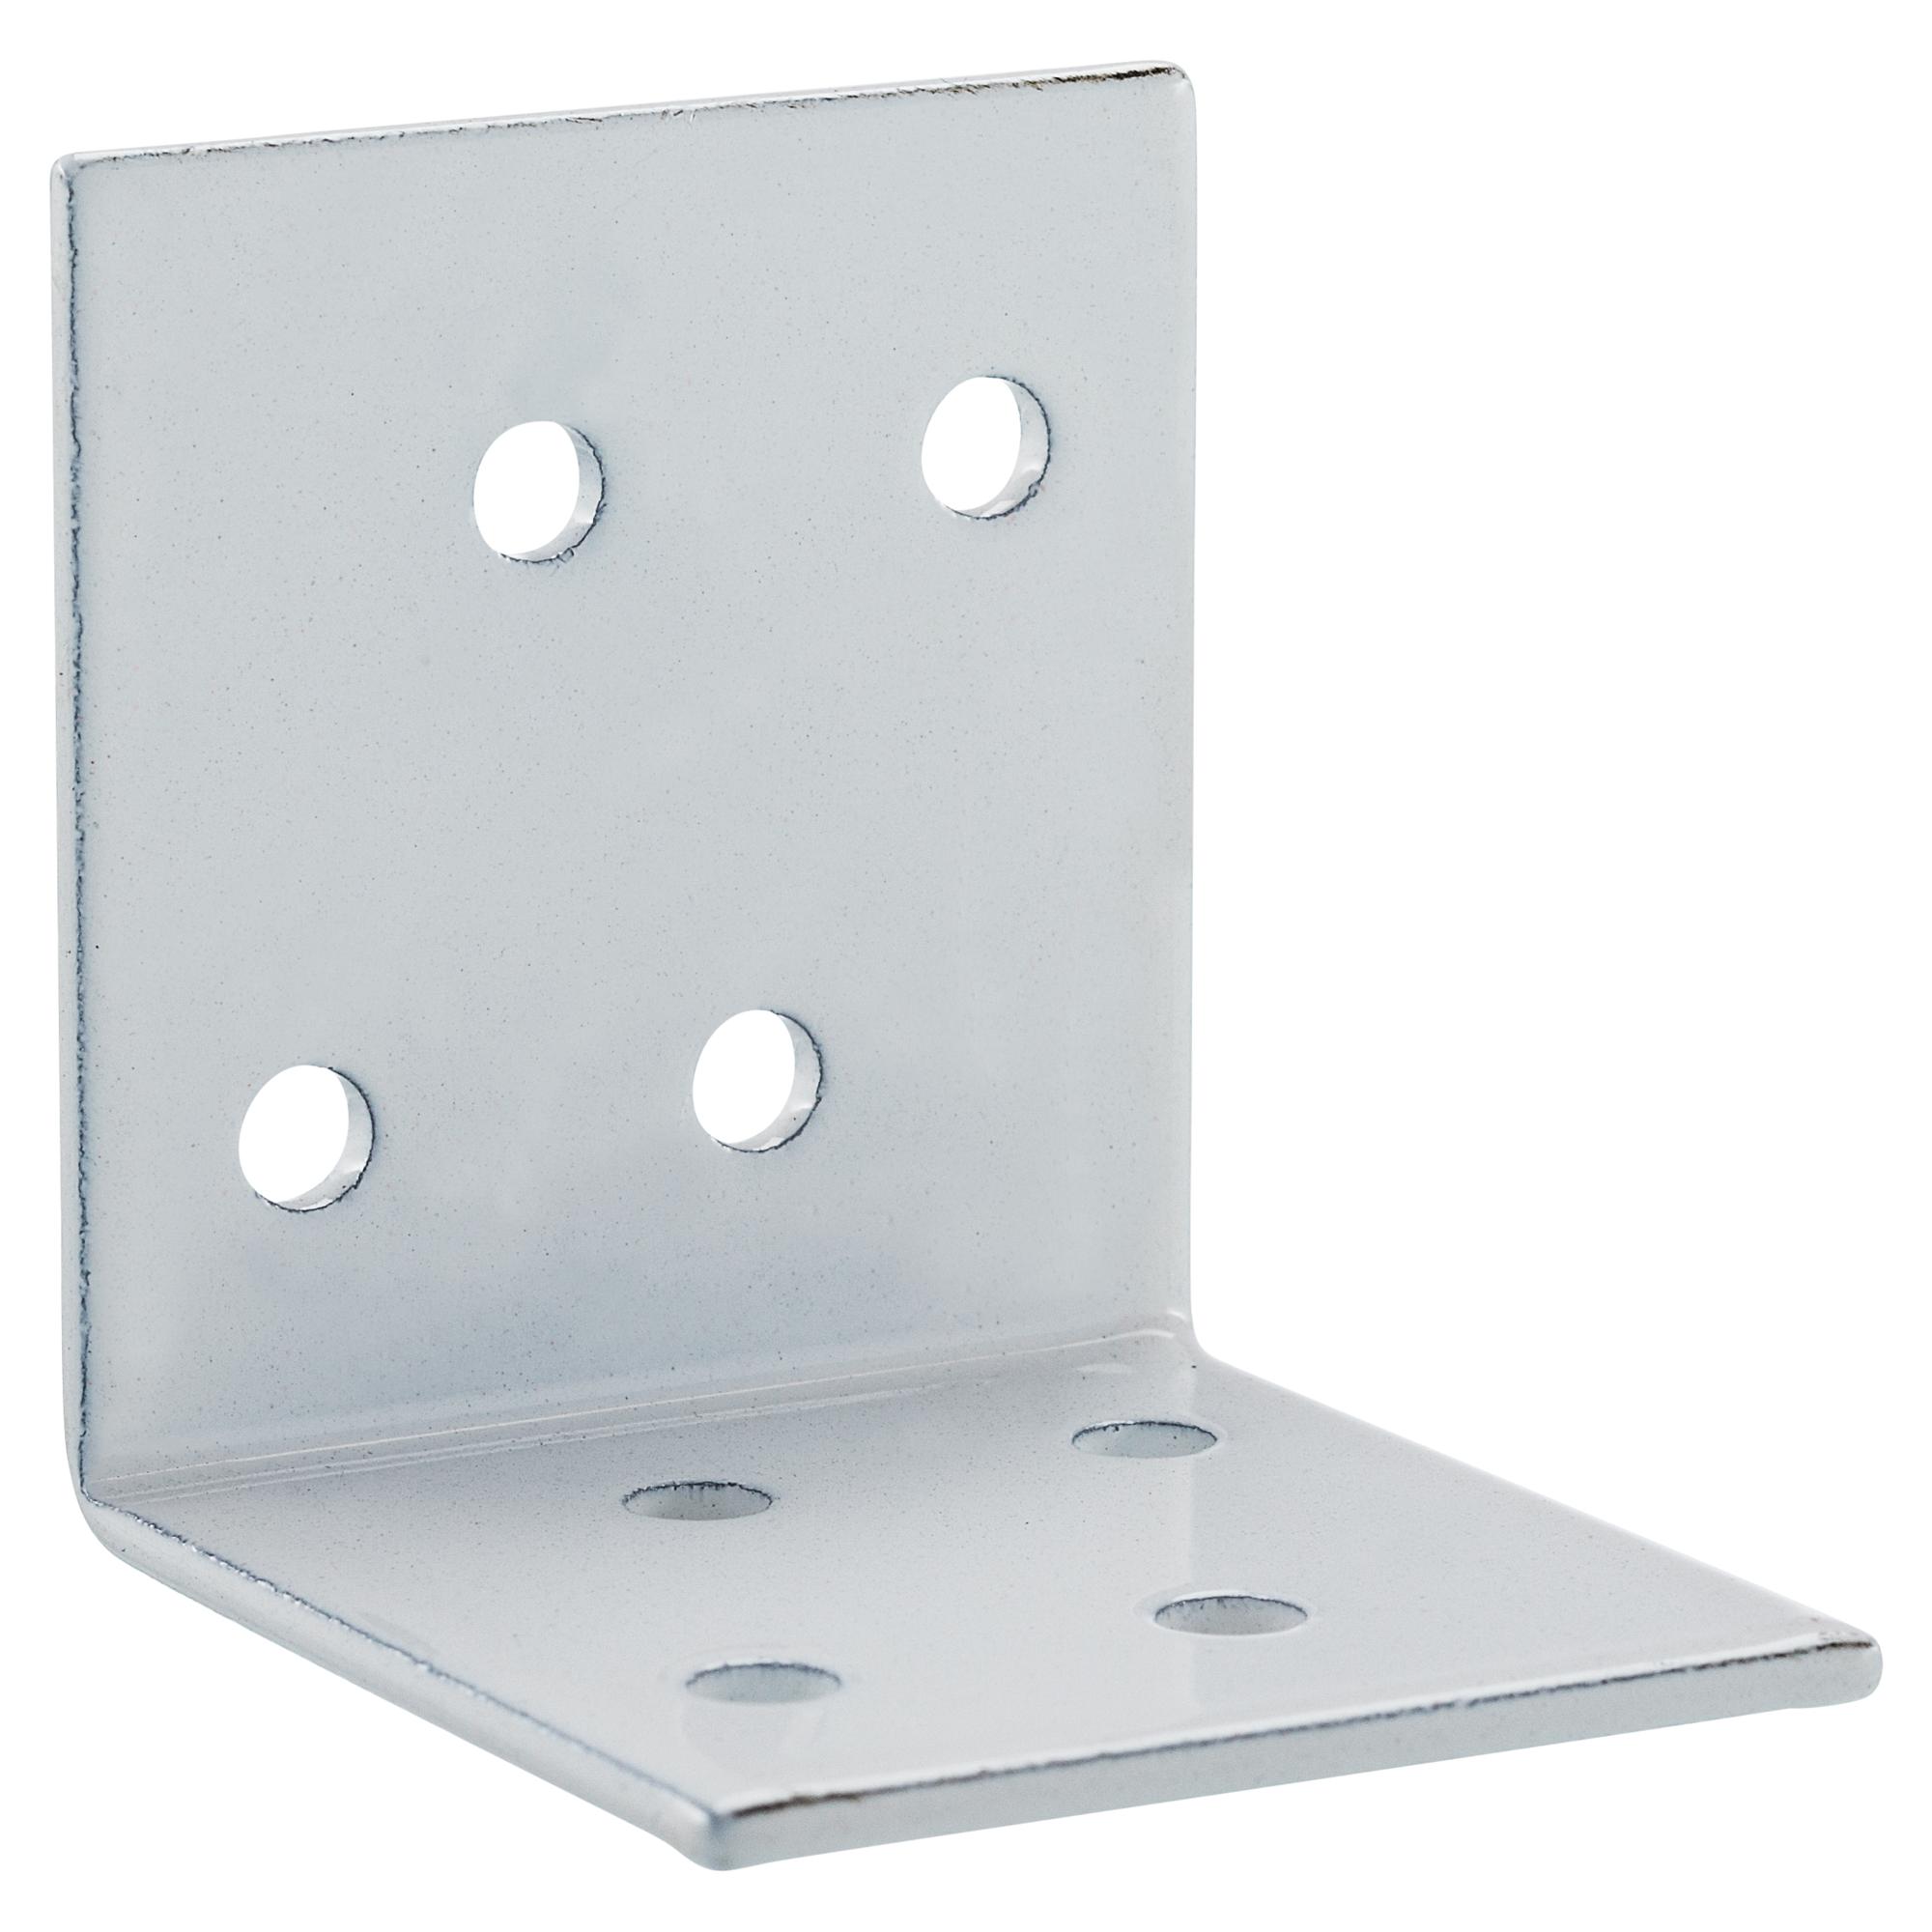 15x Lochplattenwinkel Winkelverbinder Winkel Stuhlwinkel verzinkt 60x60x40